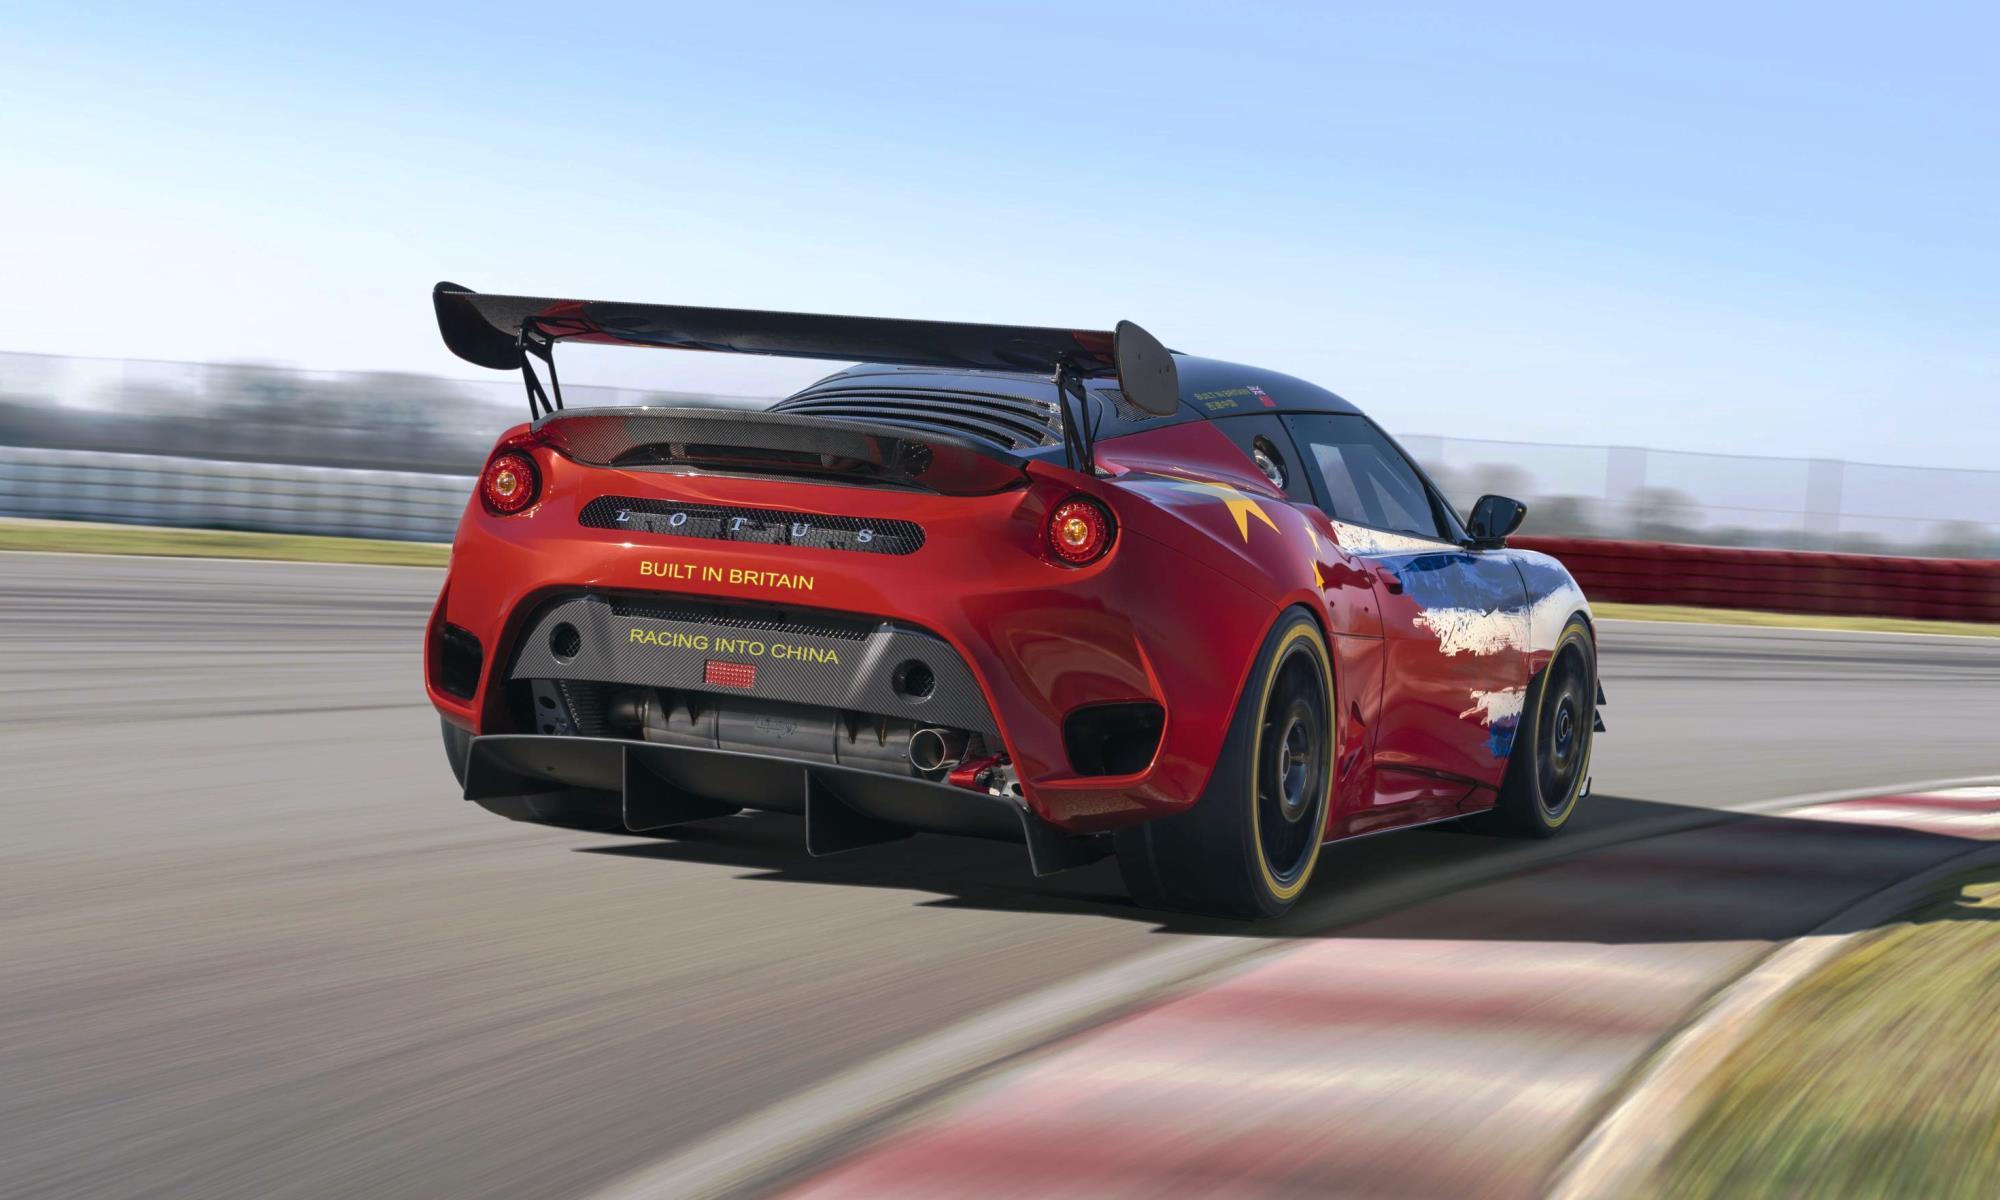 Lotus Evora GT4 Concept Racecar rear